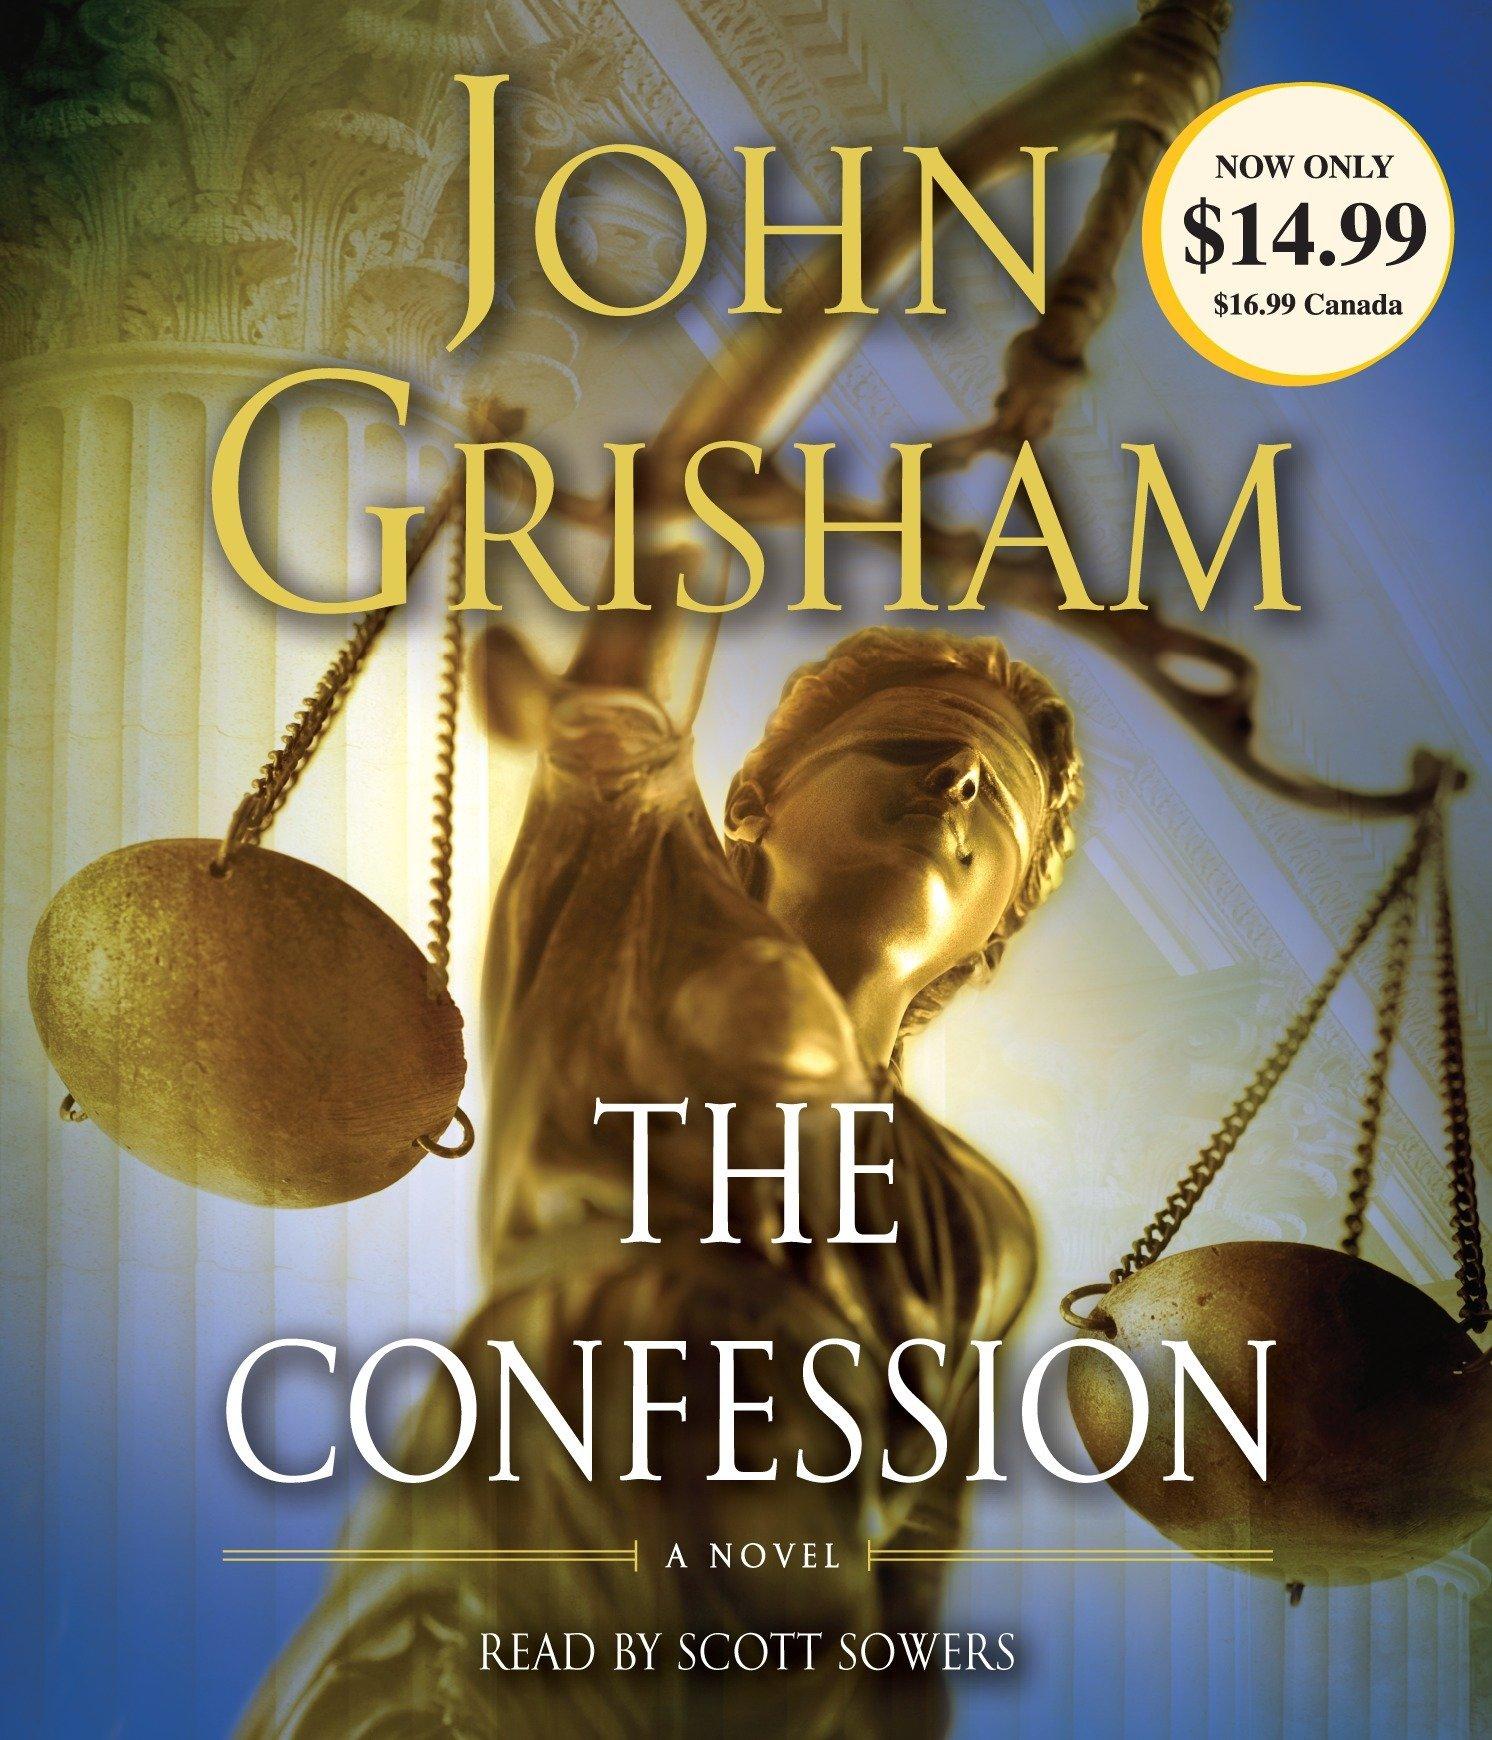 The Confession: A Novel: John Grisham, Scott Sowers: 9780307970893:  Amazon.com: Books